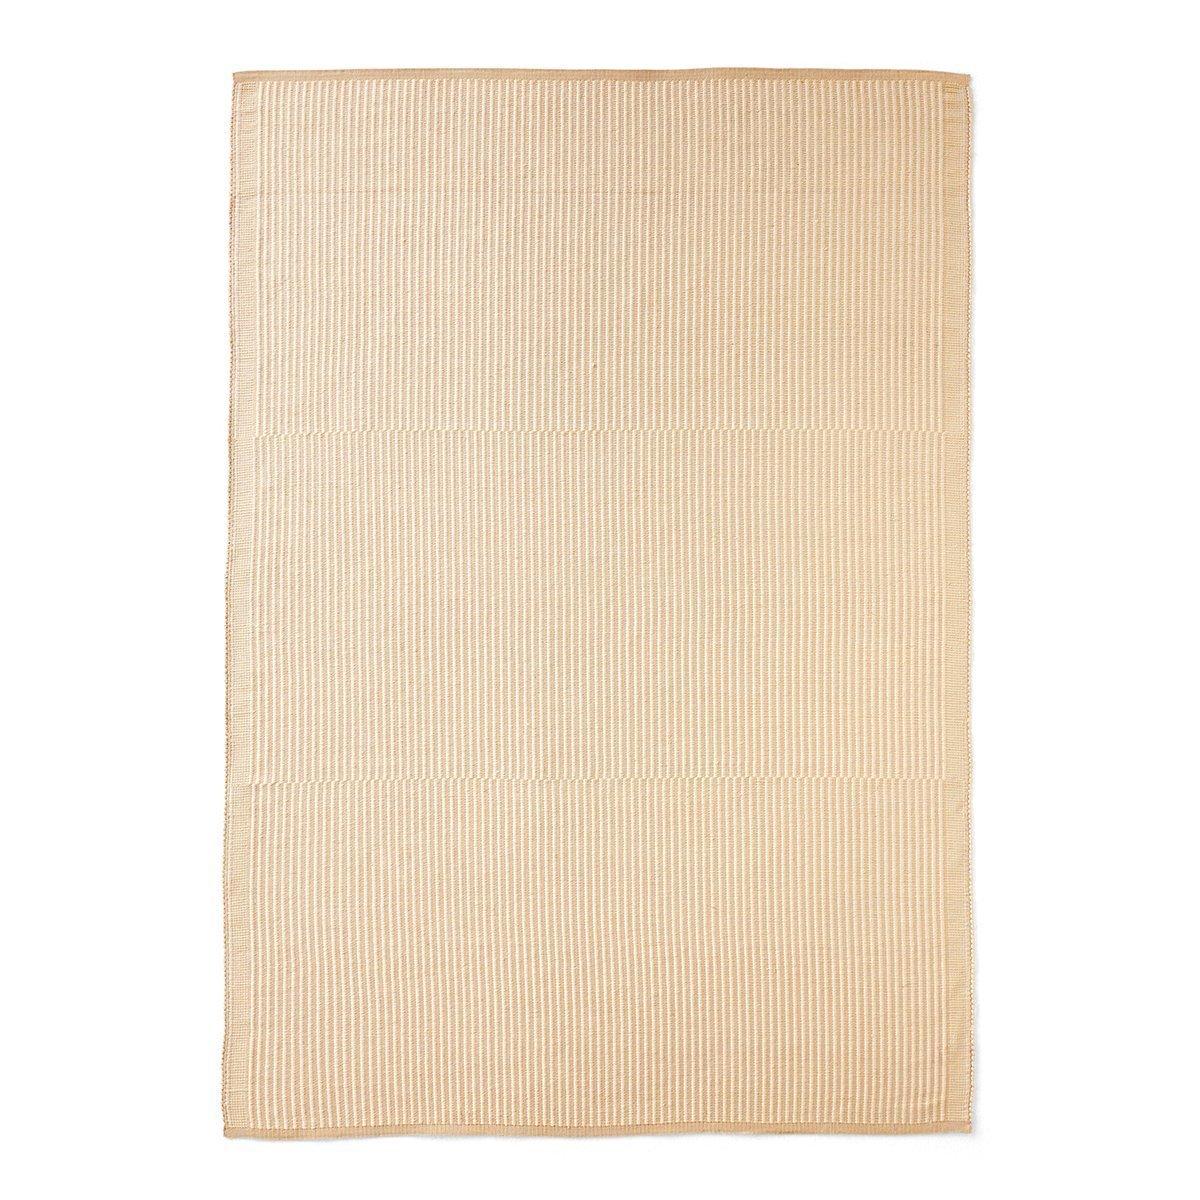 HAY Tapis Vloerkleed - Offwhite & Lavender - 240 x 170 cm.